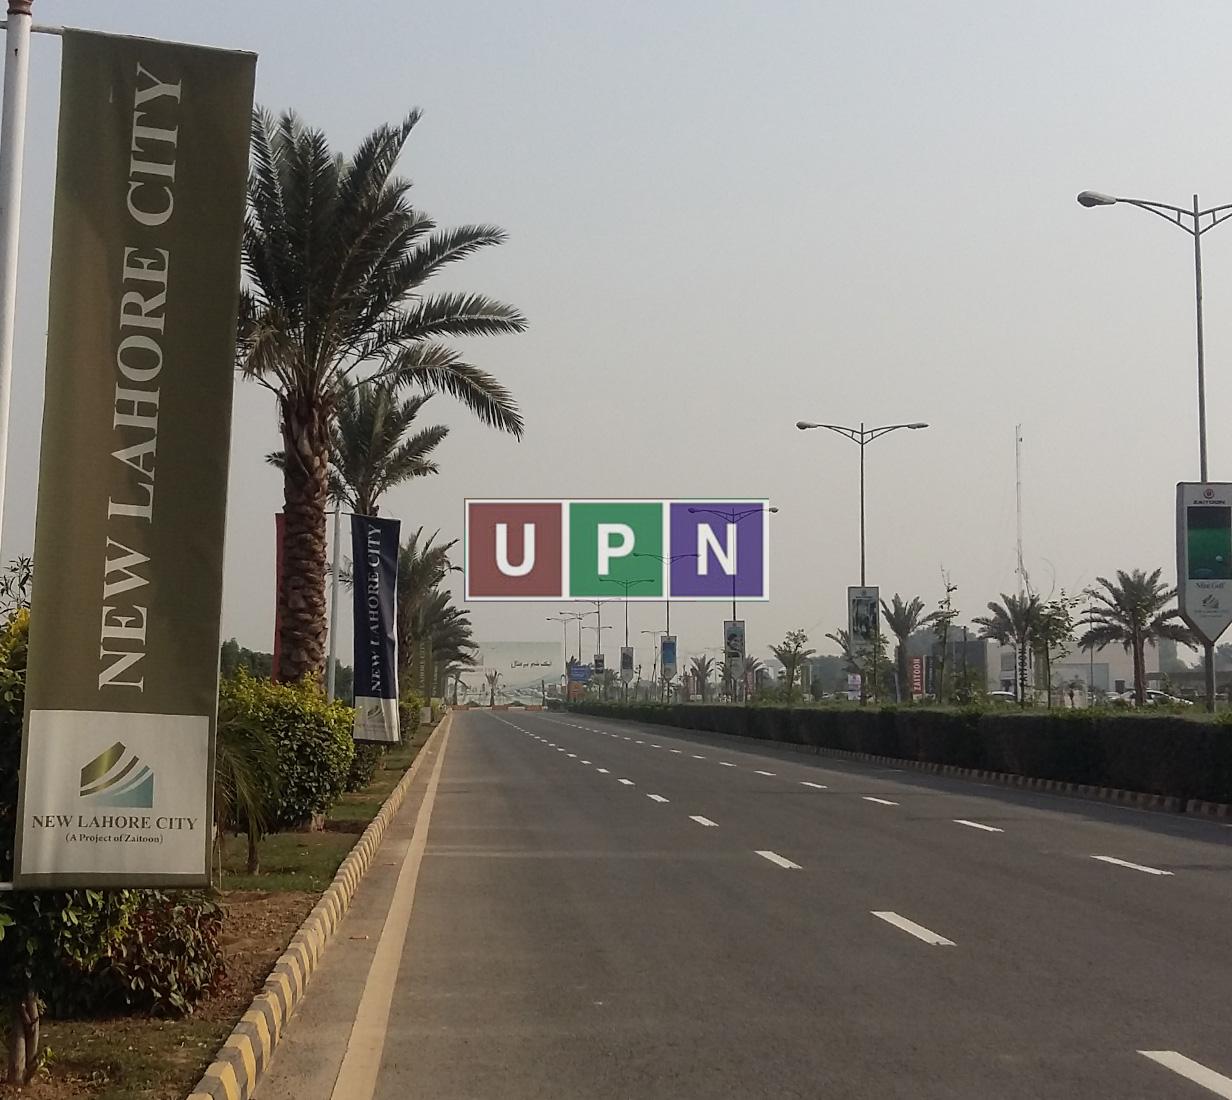 8 MARLA Residential Plot, Platinum Enclave New Lahore City